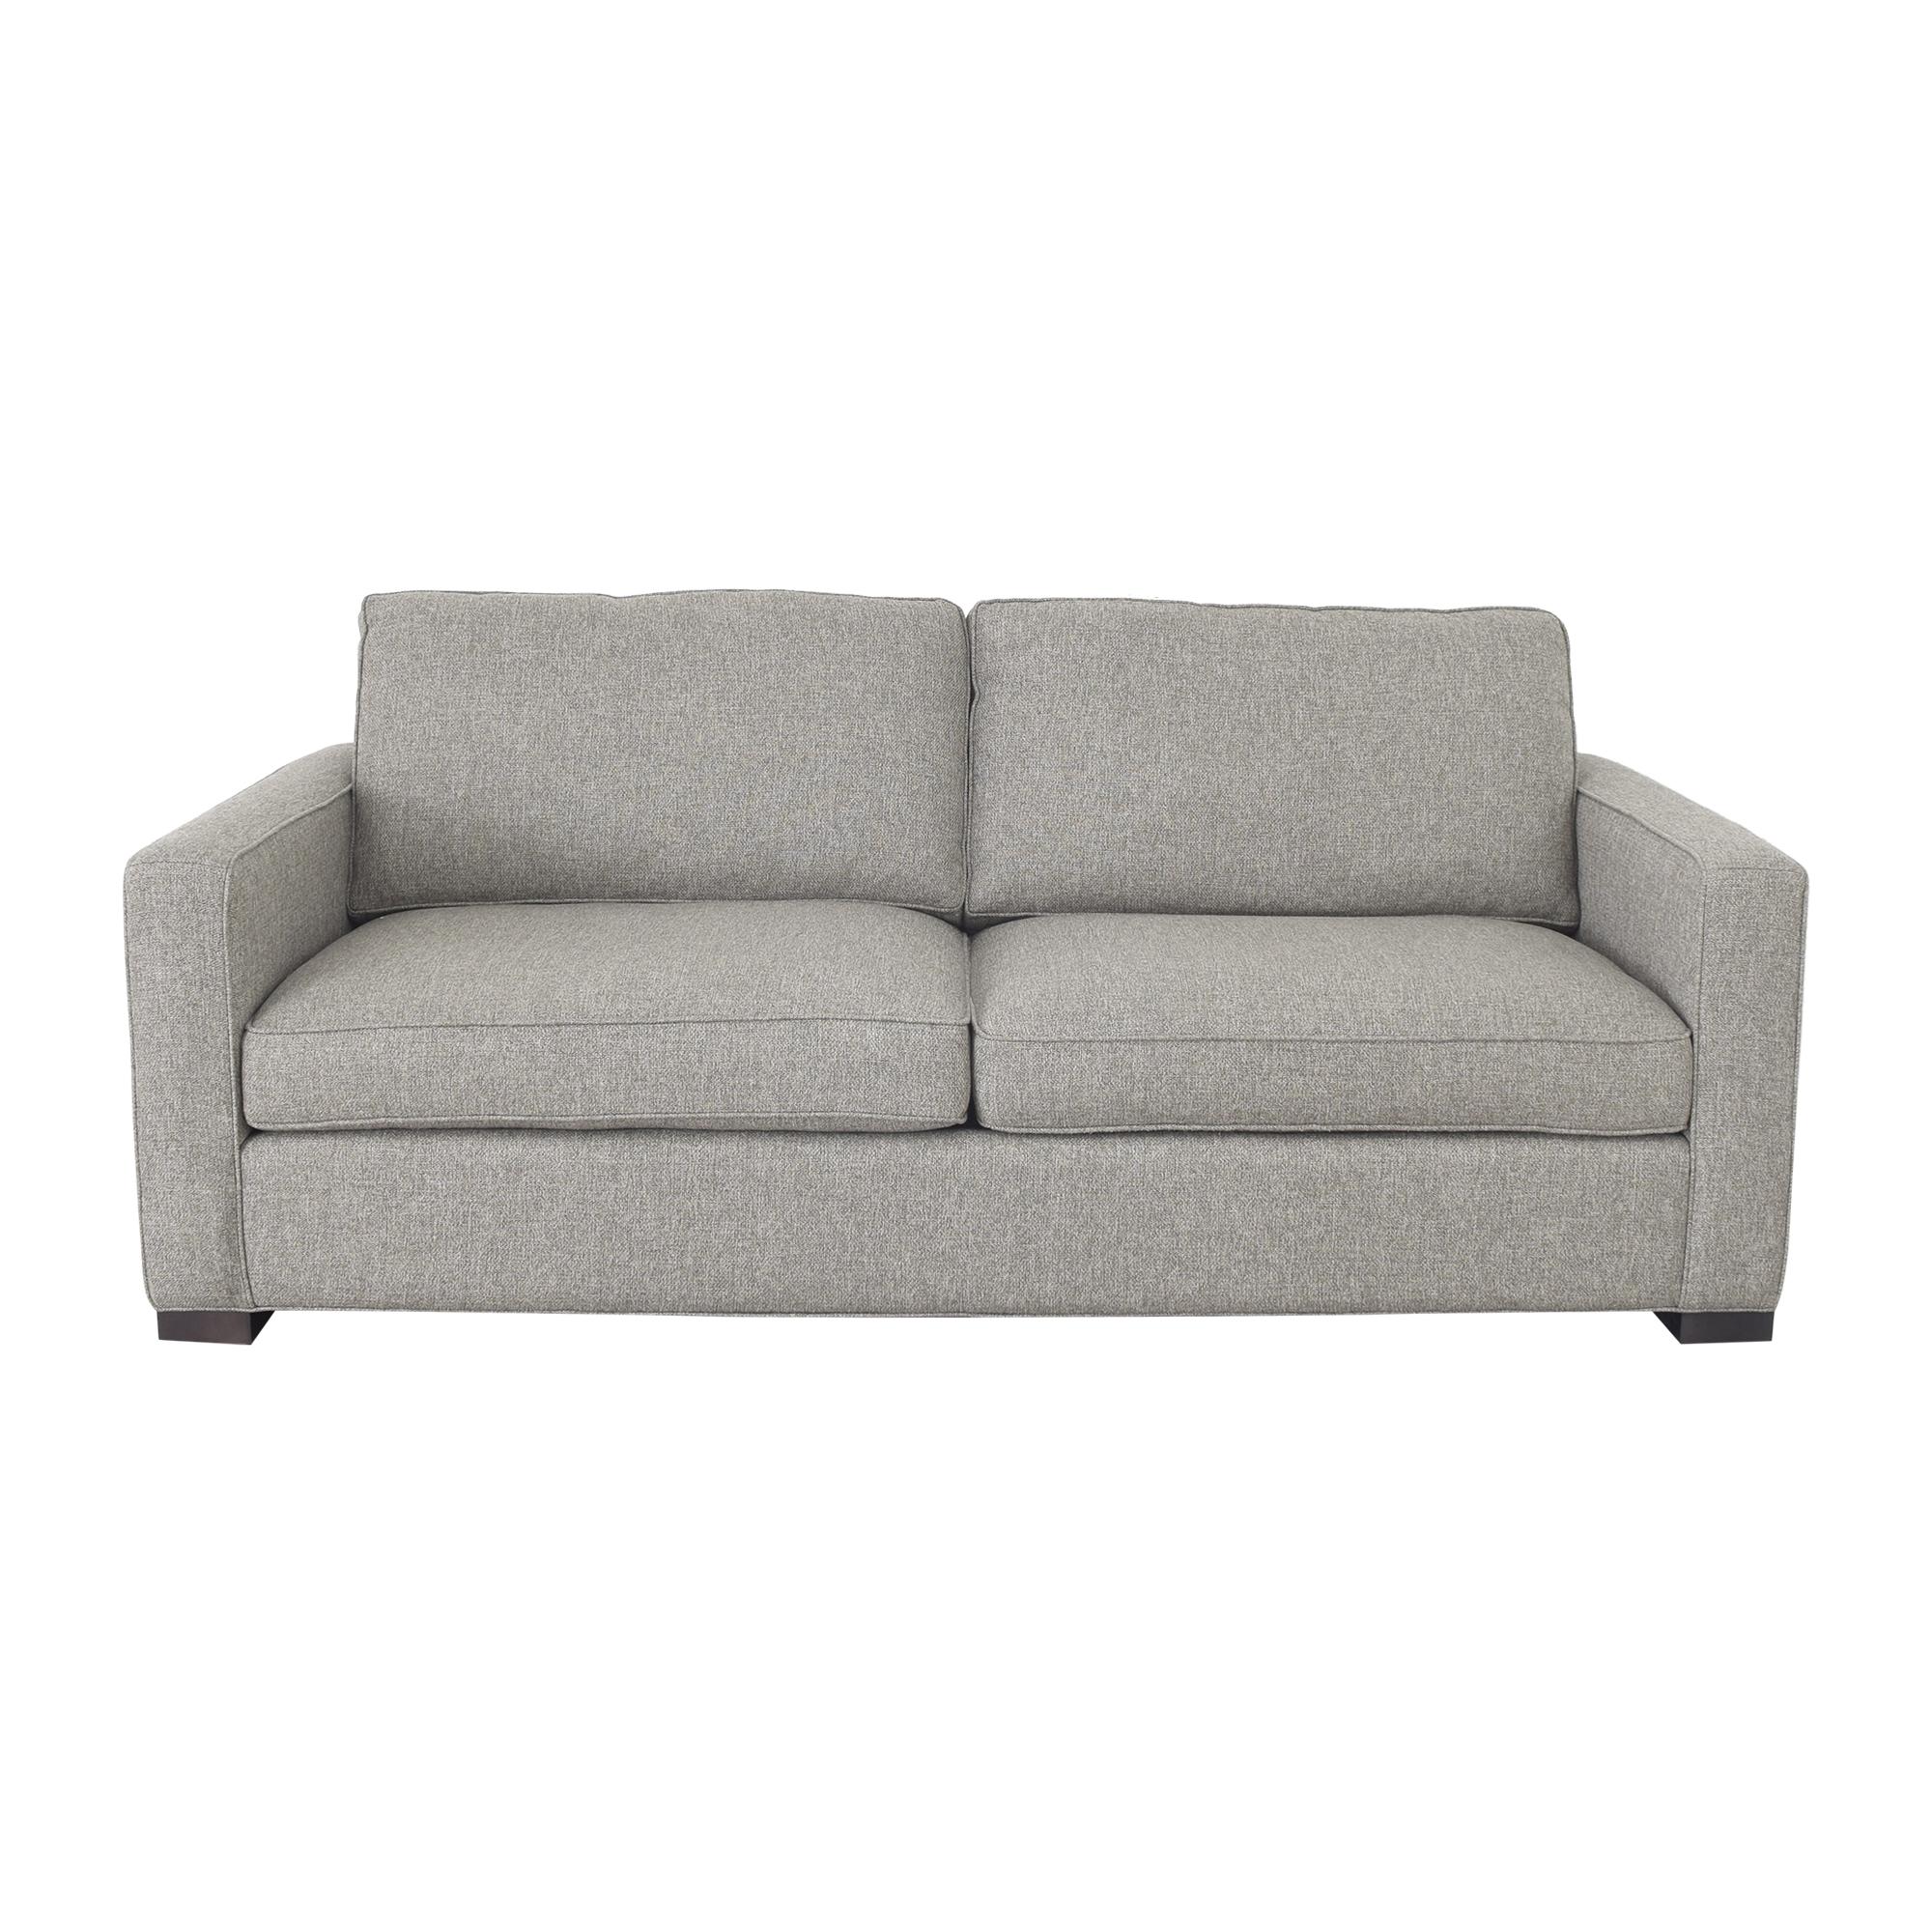 Room & Board Morrison Sofa / Classic Sofas